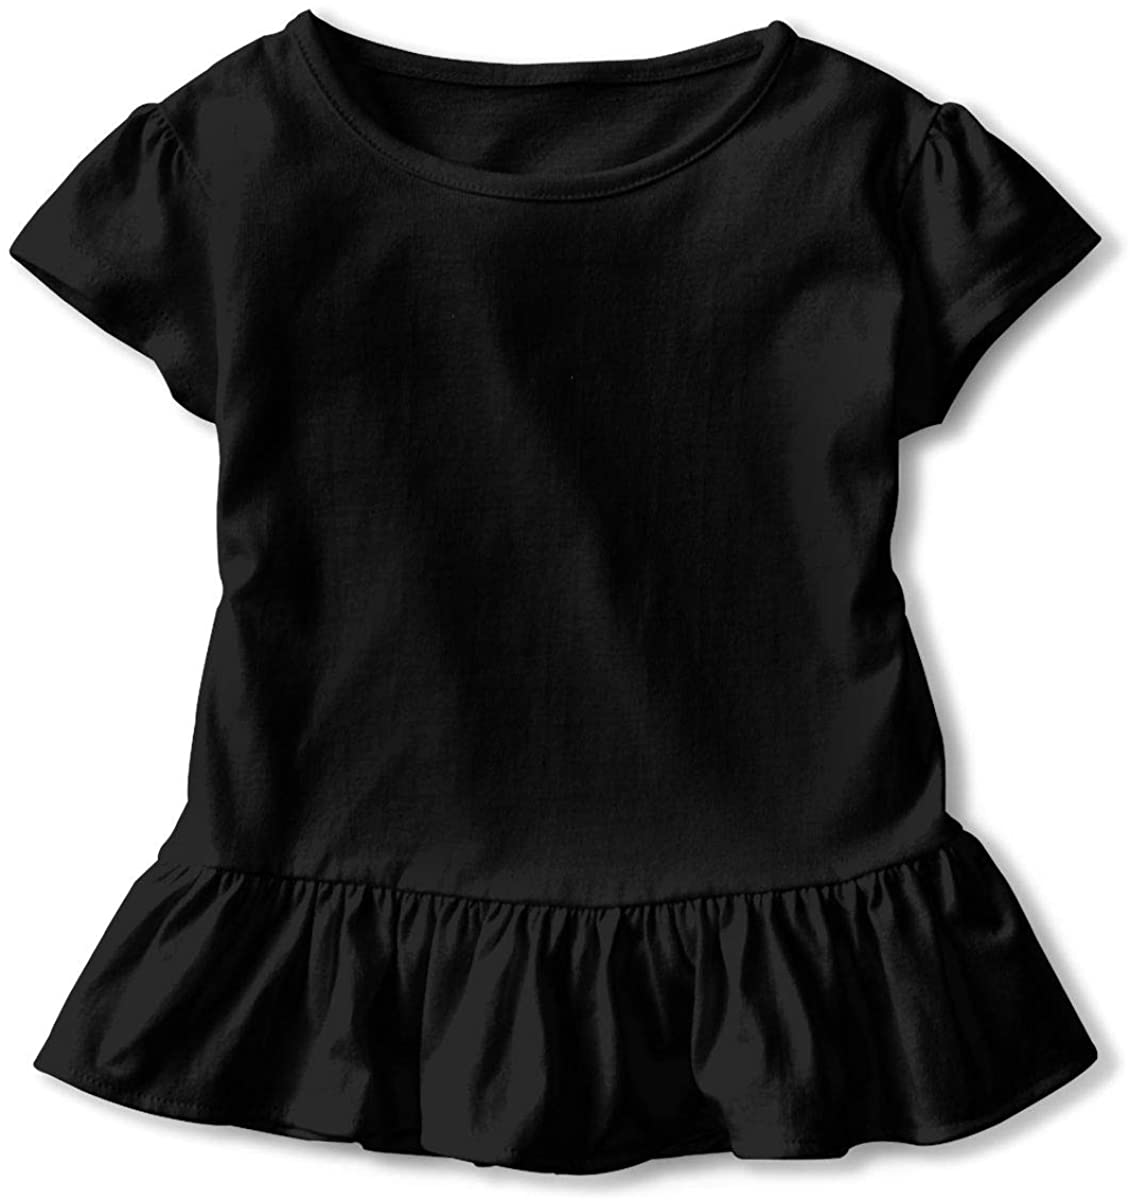 Kids Document One Logo Toddler Short Sleeve T Shirt Children Girls Cotton Graphic Tee Soft Dress (2-6T)